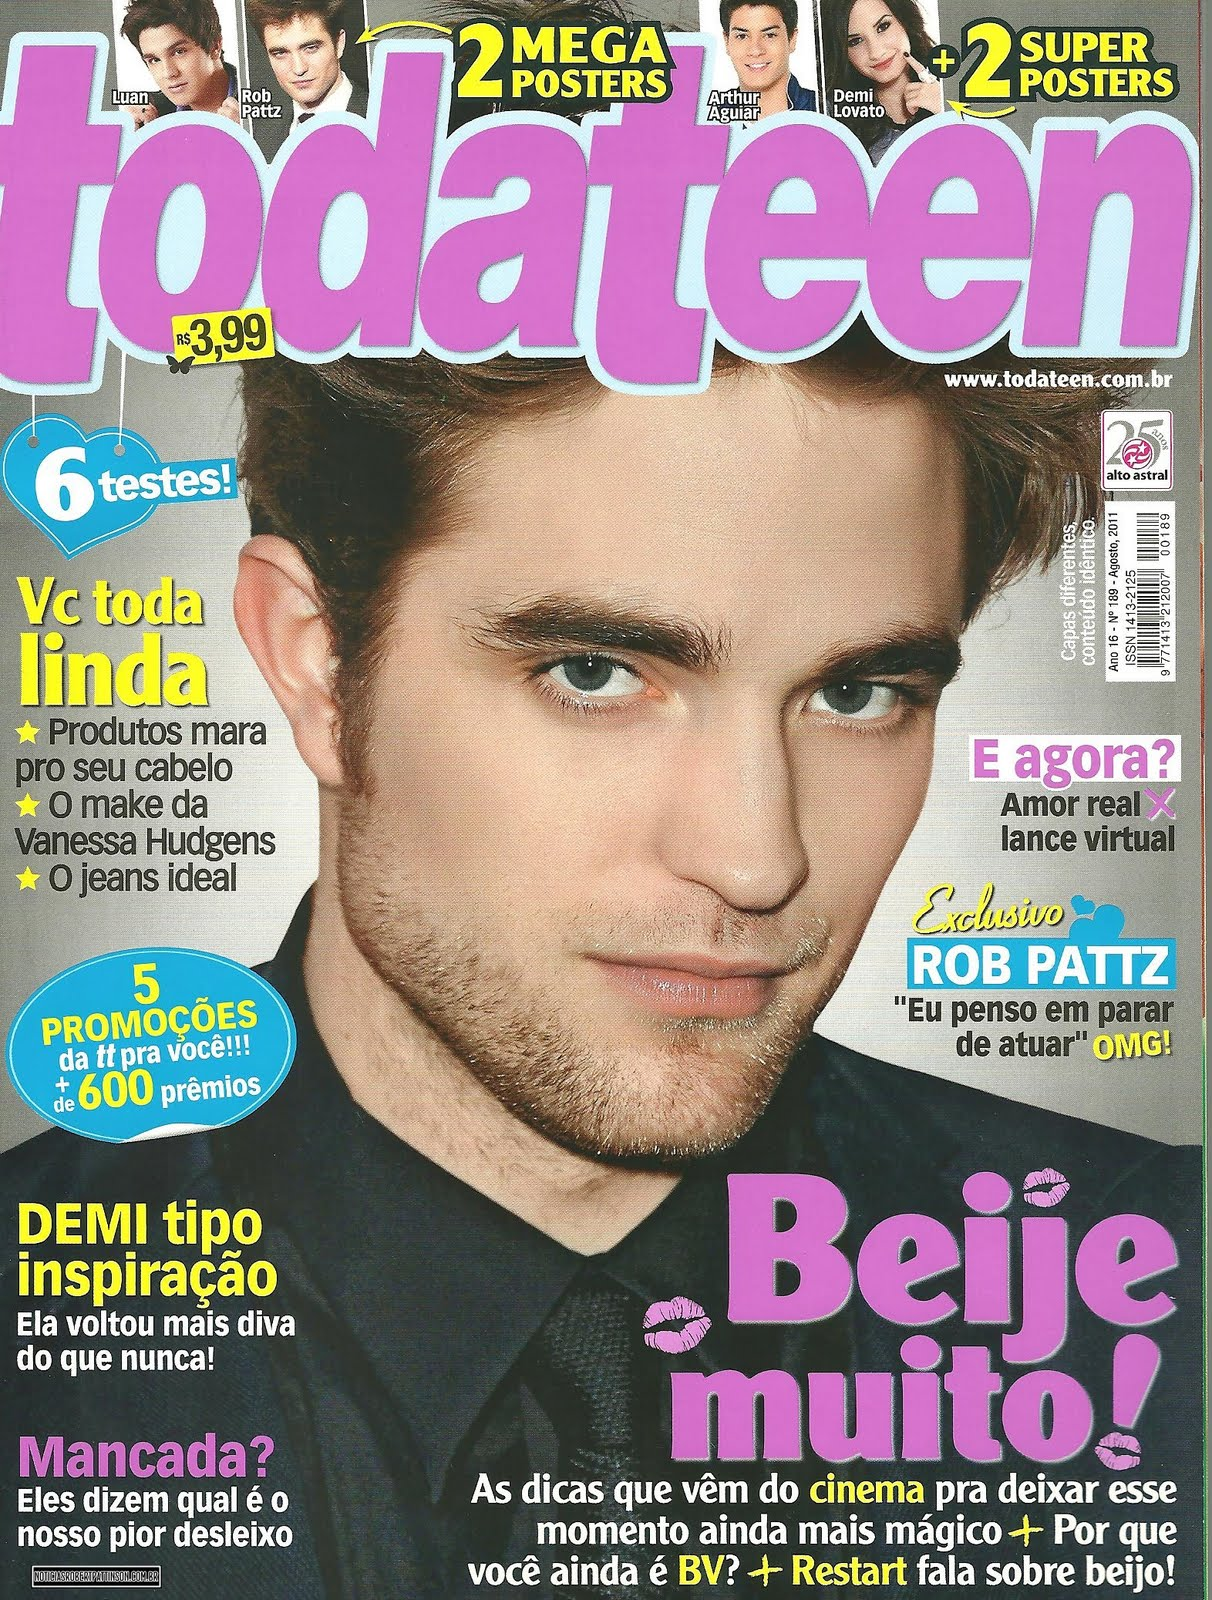 Robert Pattinson in